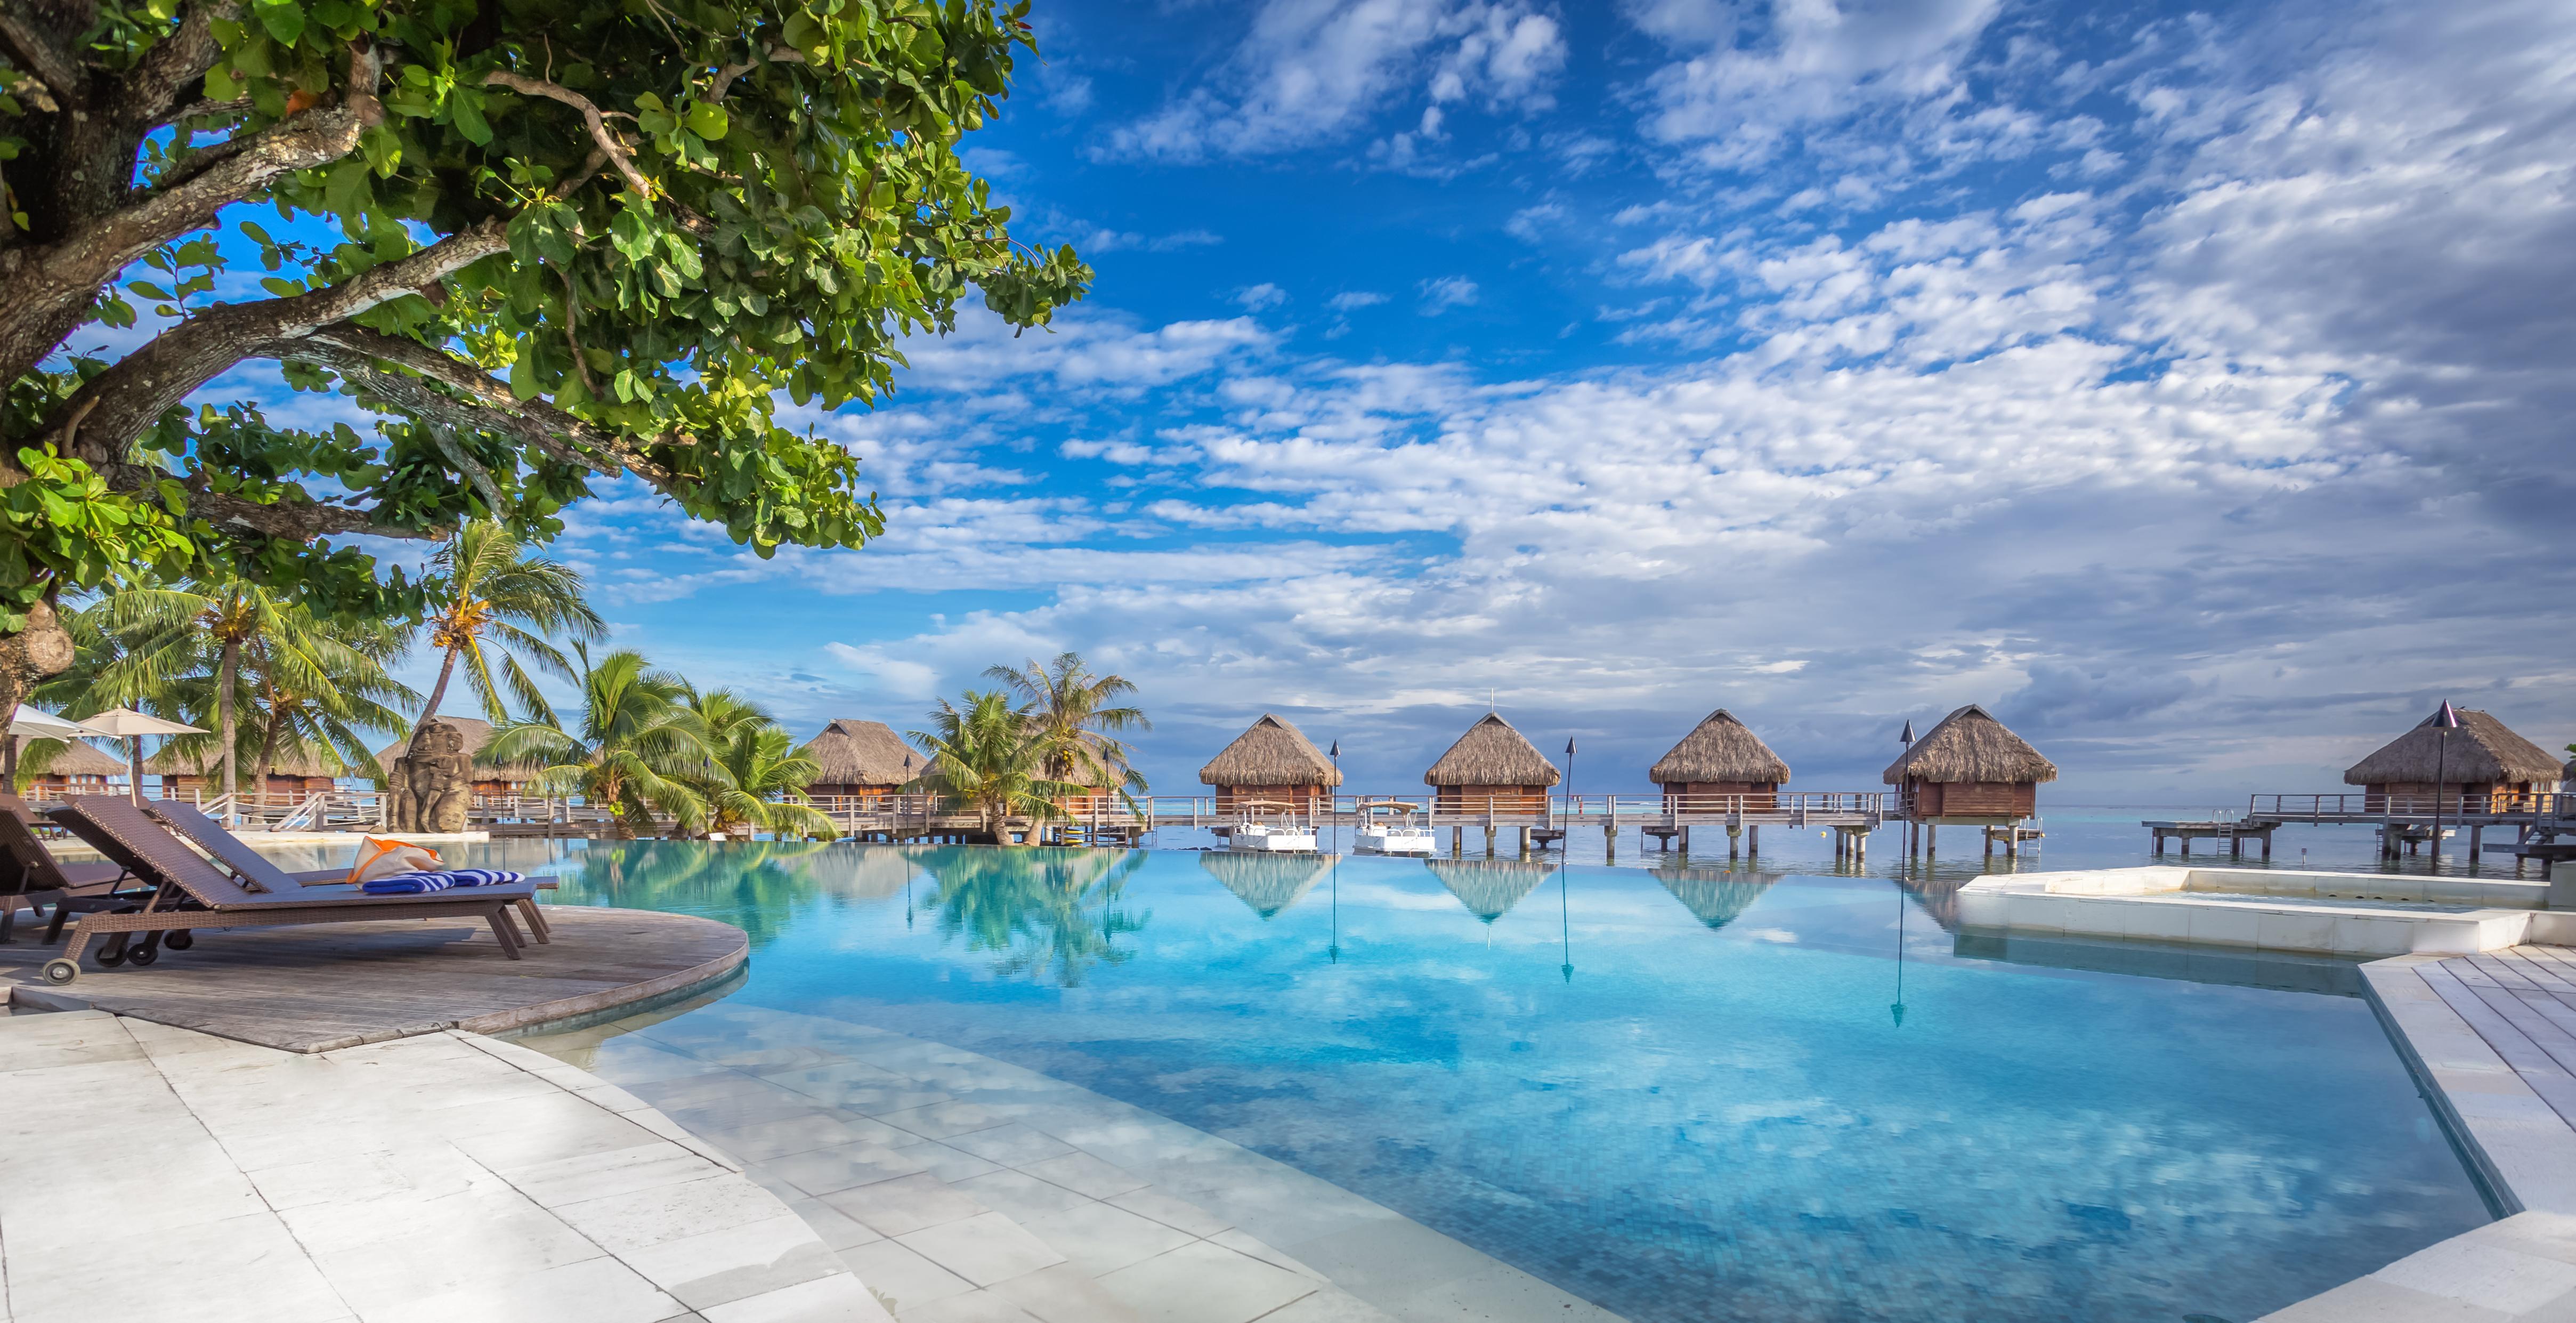 https://tahititourisme.de/wp-content/uploads/2017/08/HEBERGEMENT-Manava-Beach-Resort-and-Spa-Moorea-1-Charles_Veronese.jpg